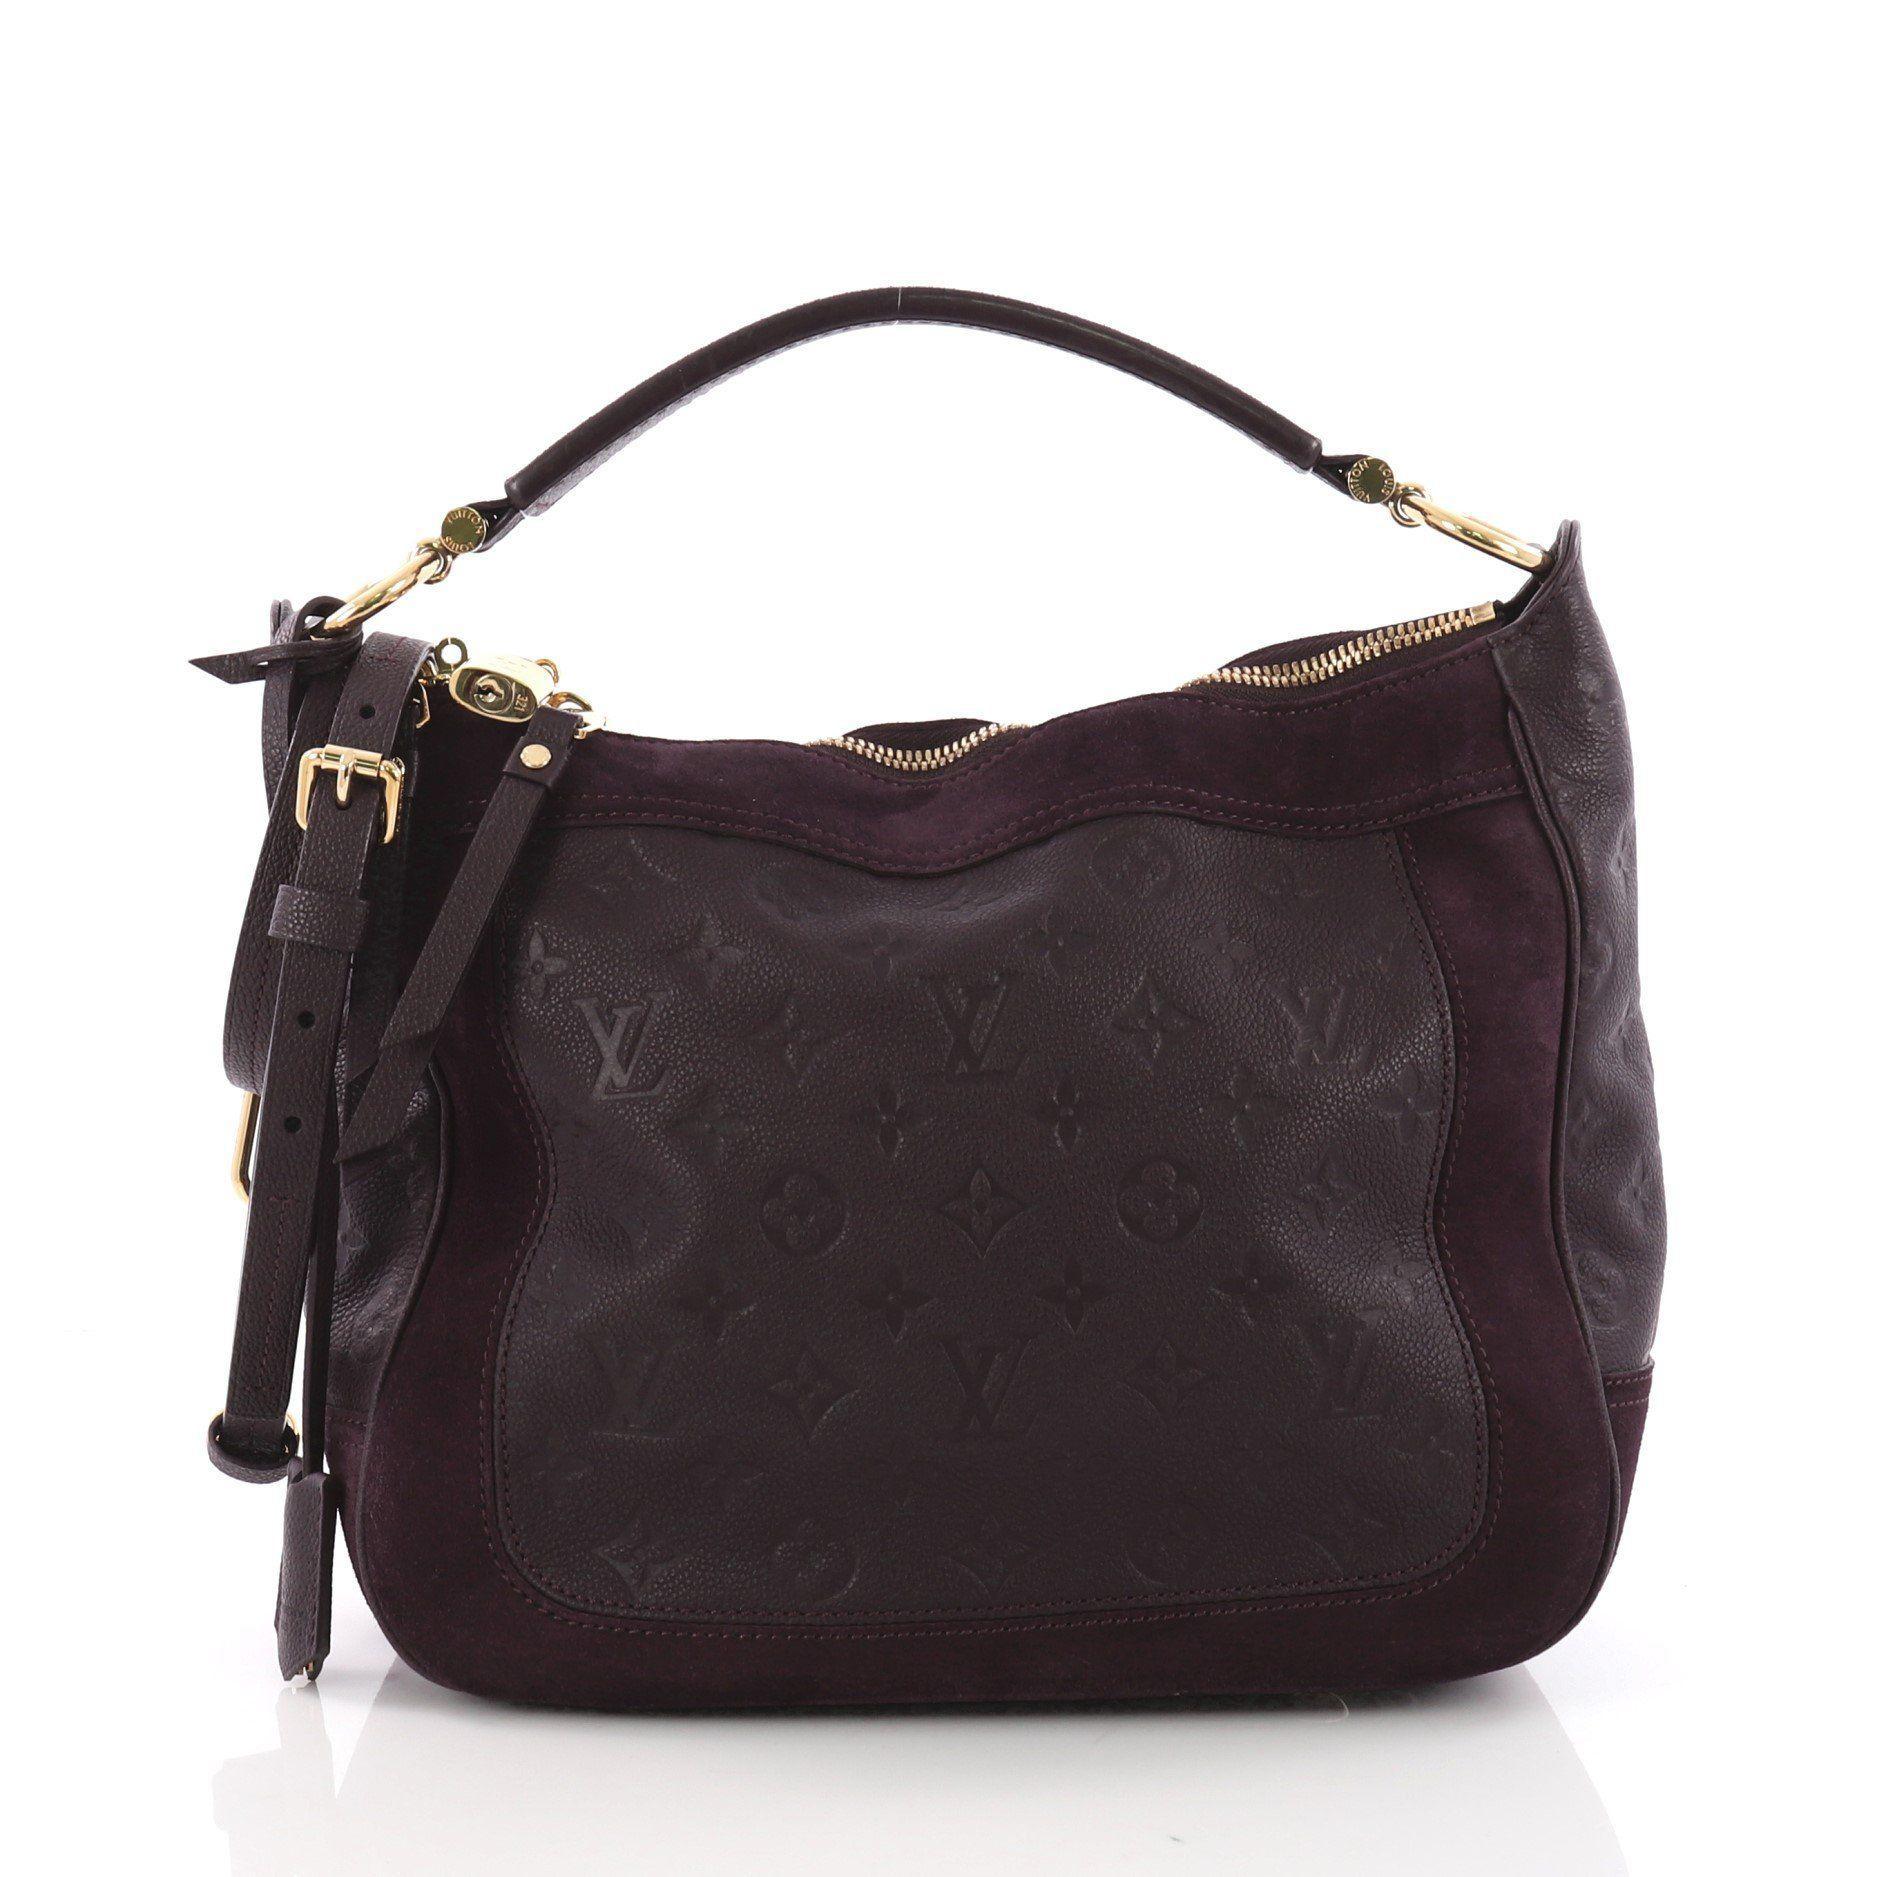 19fd5fa0b88b Louis Vuitton. Women s Pre Owned Audacieuse Handbag Monogram Empreinte  Leather Pm